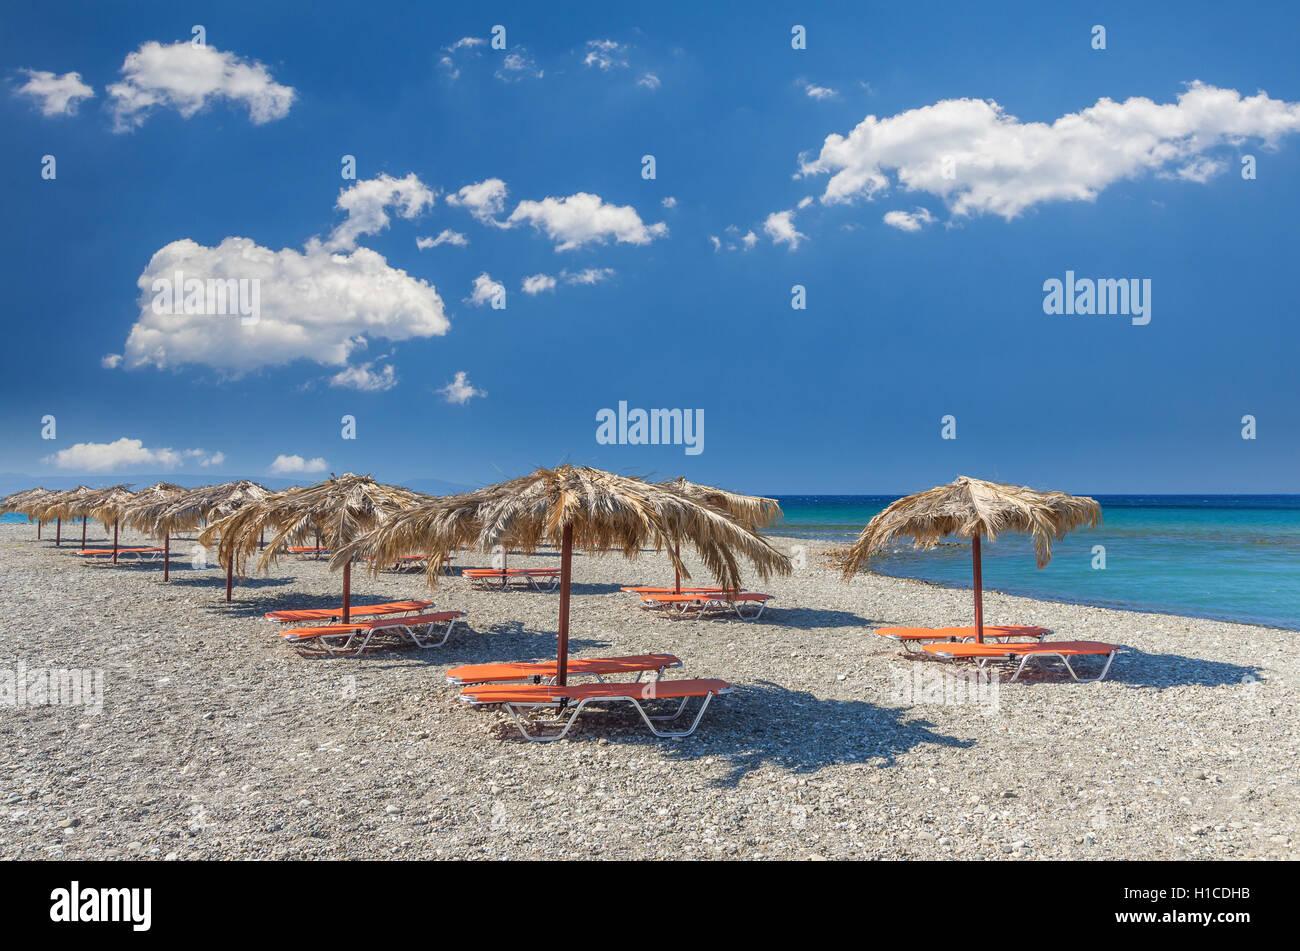 Straw umbrella on a sandy beach in Greece. Beach chairs with umbrellas on a beautiful beach in Crete island. Stock Photo